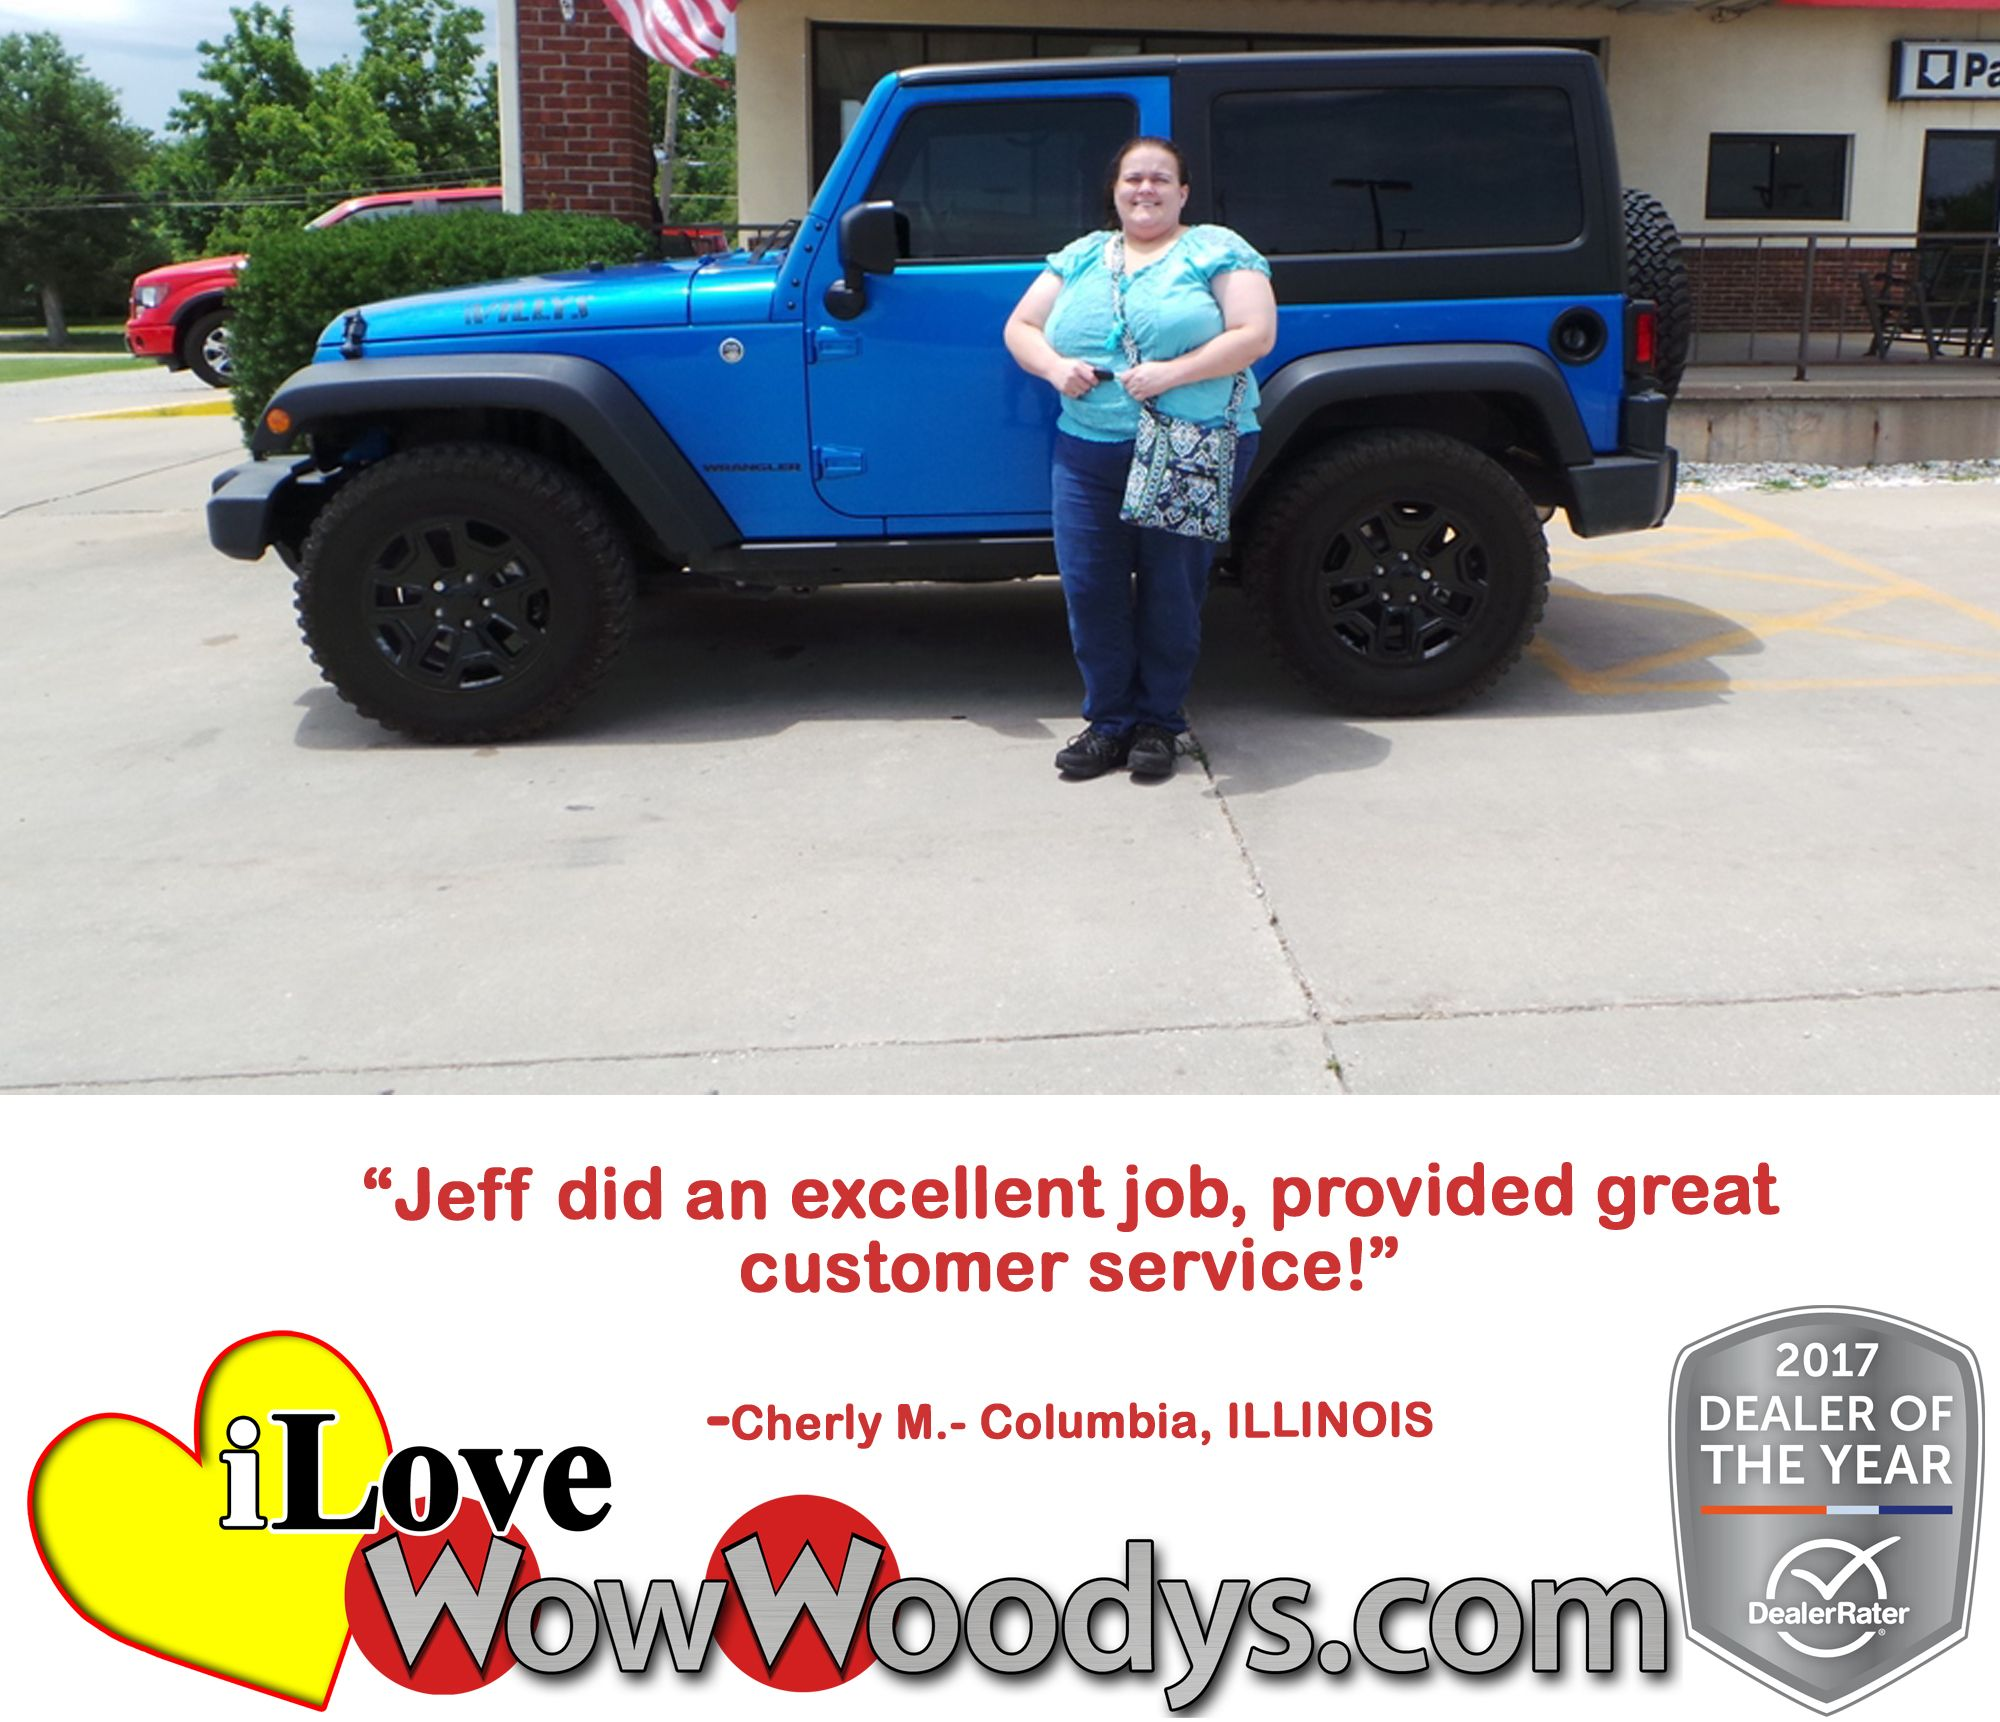 Jeep Customer Service >> Columbia Illinois Jeep Wrangler Customer Says Jeff Did An